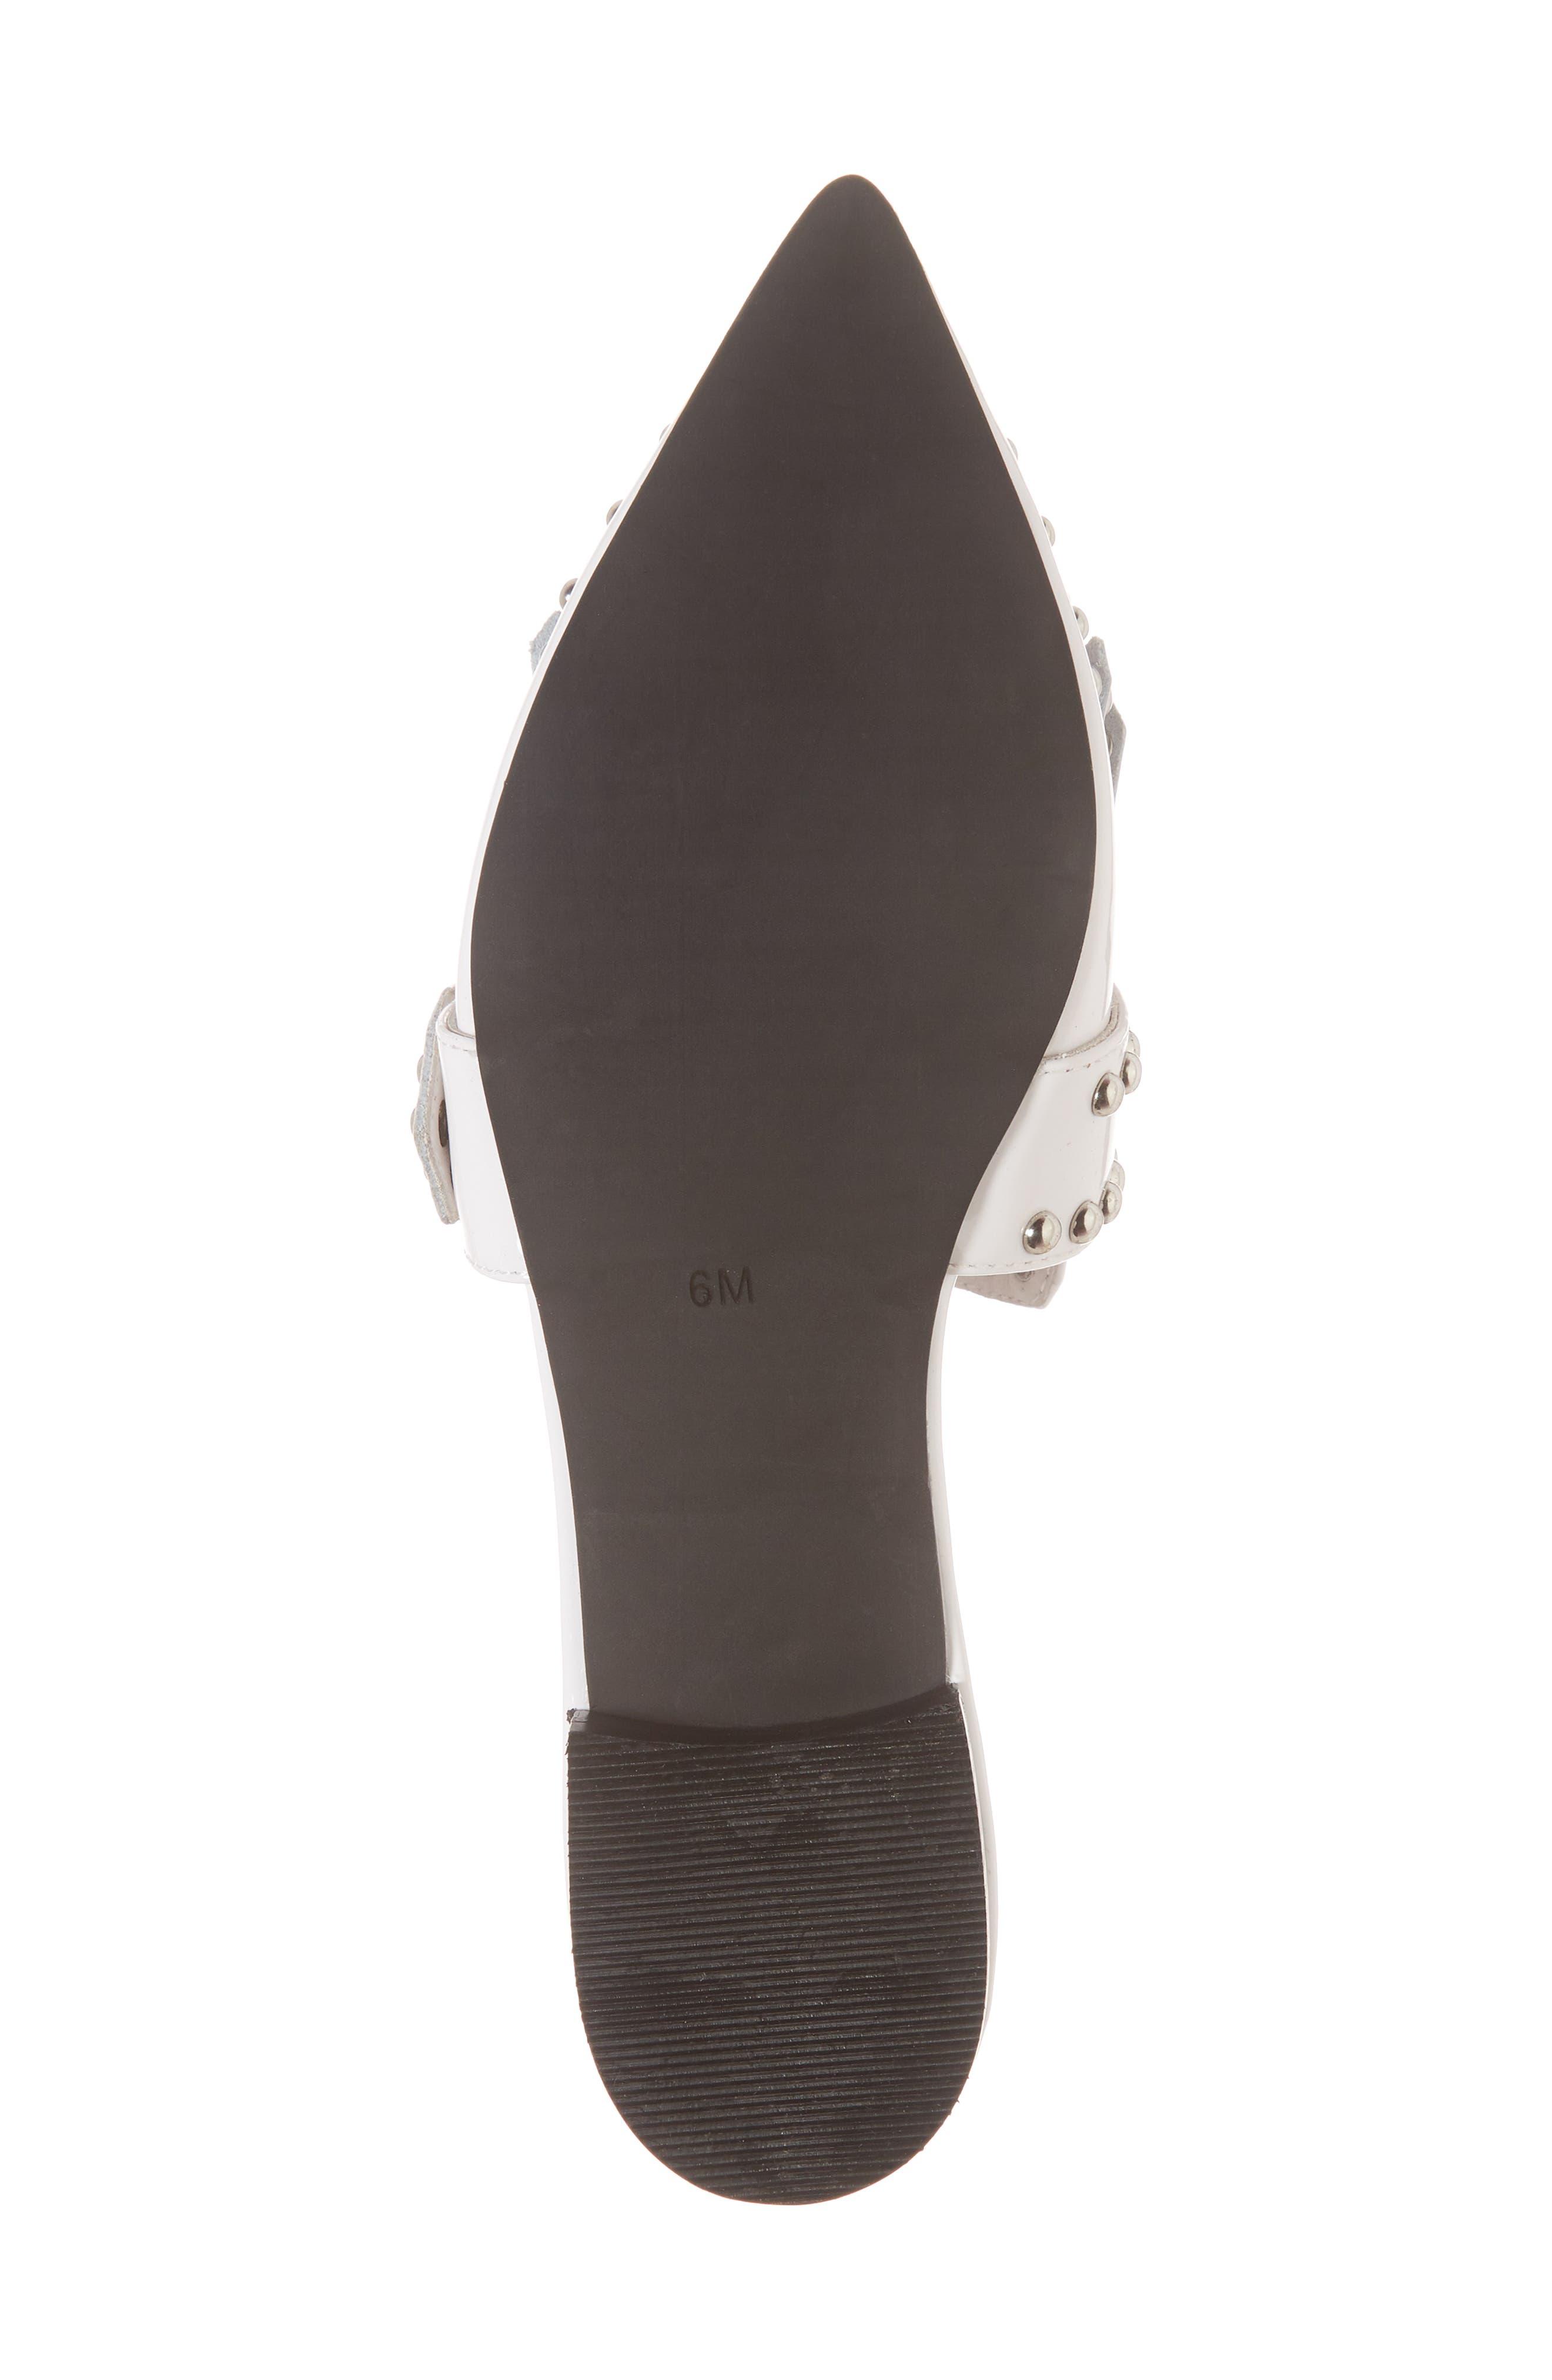 Daniel Studded Loafer Mule,                             Alternate thumbnail 6, color,                             White Patent